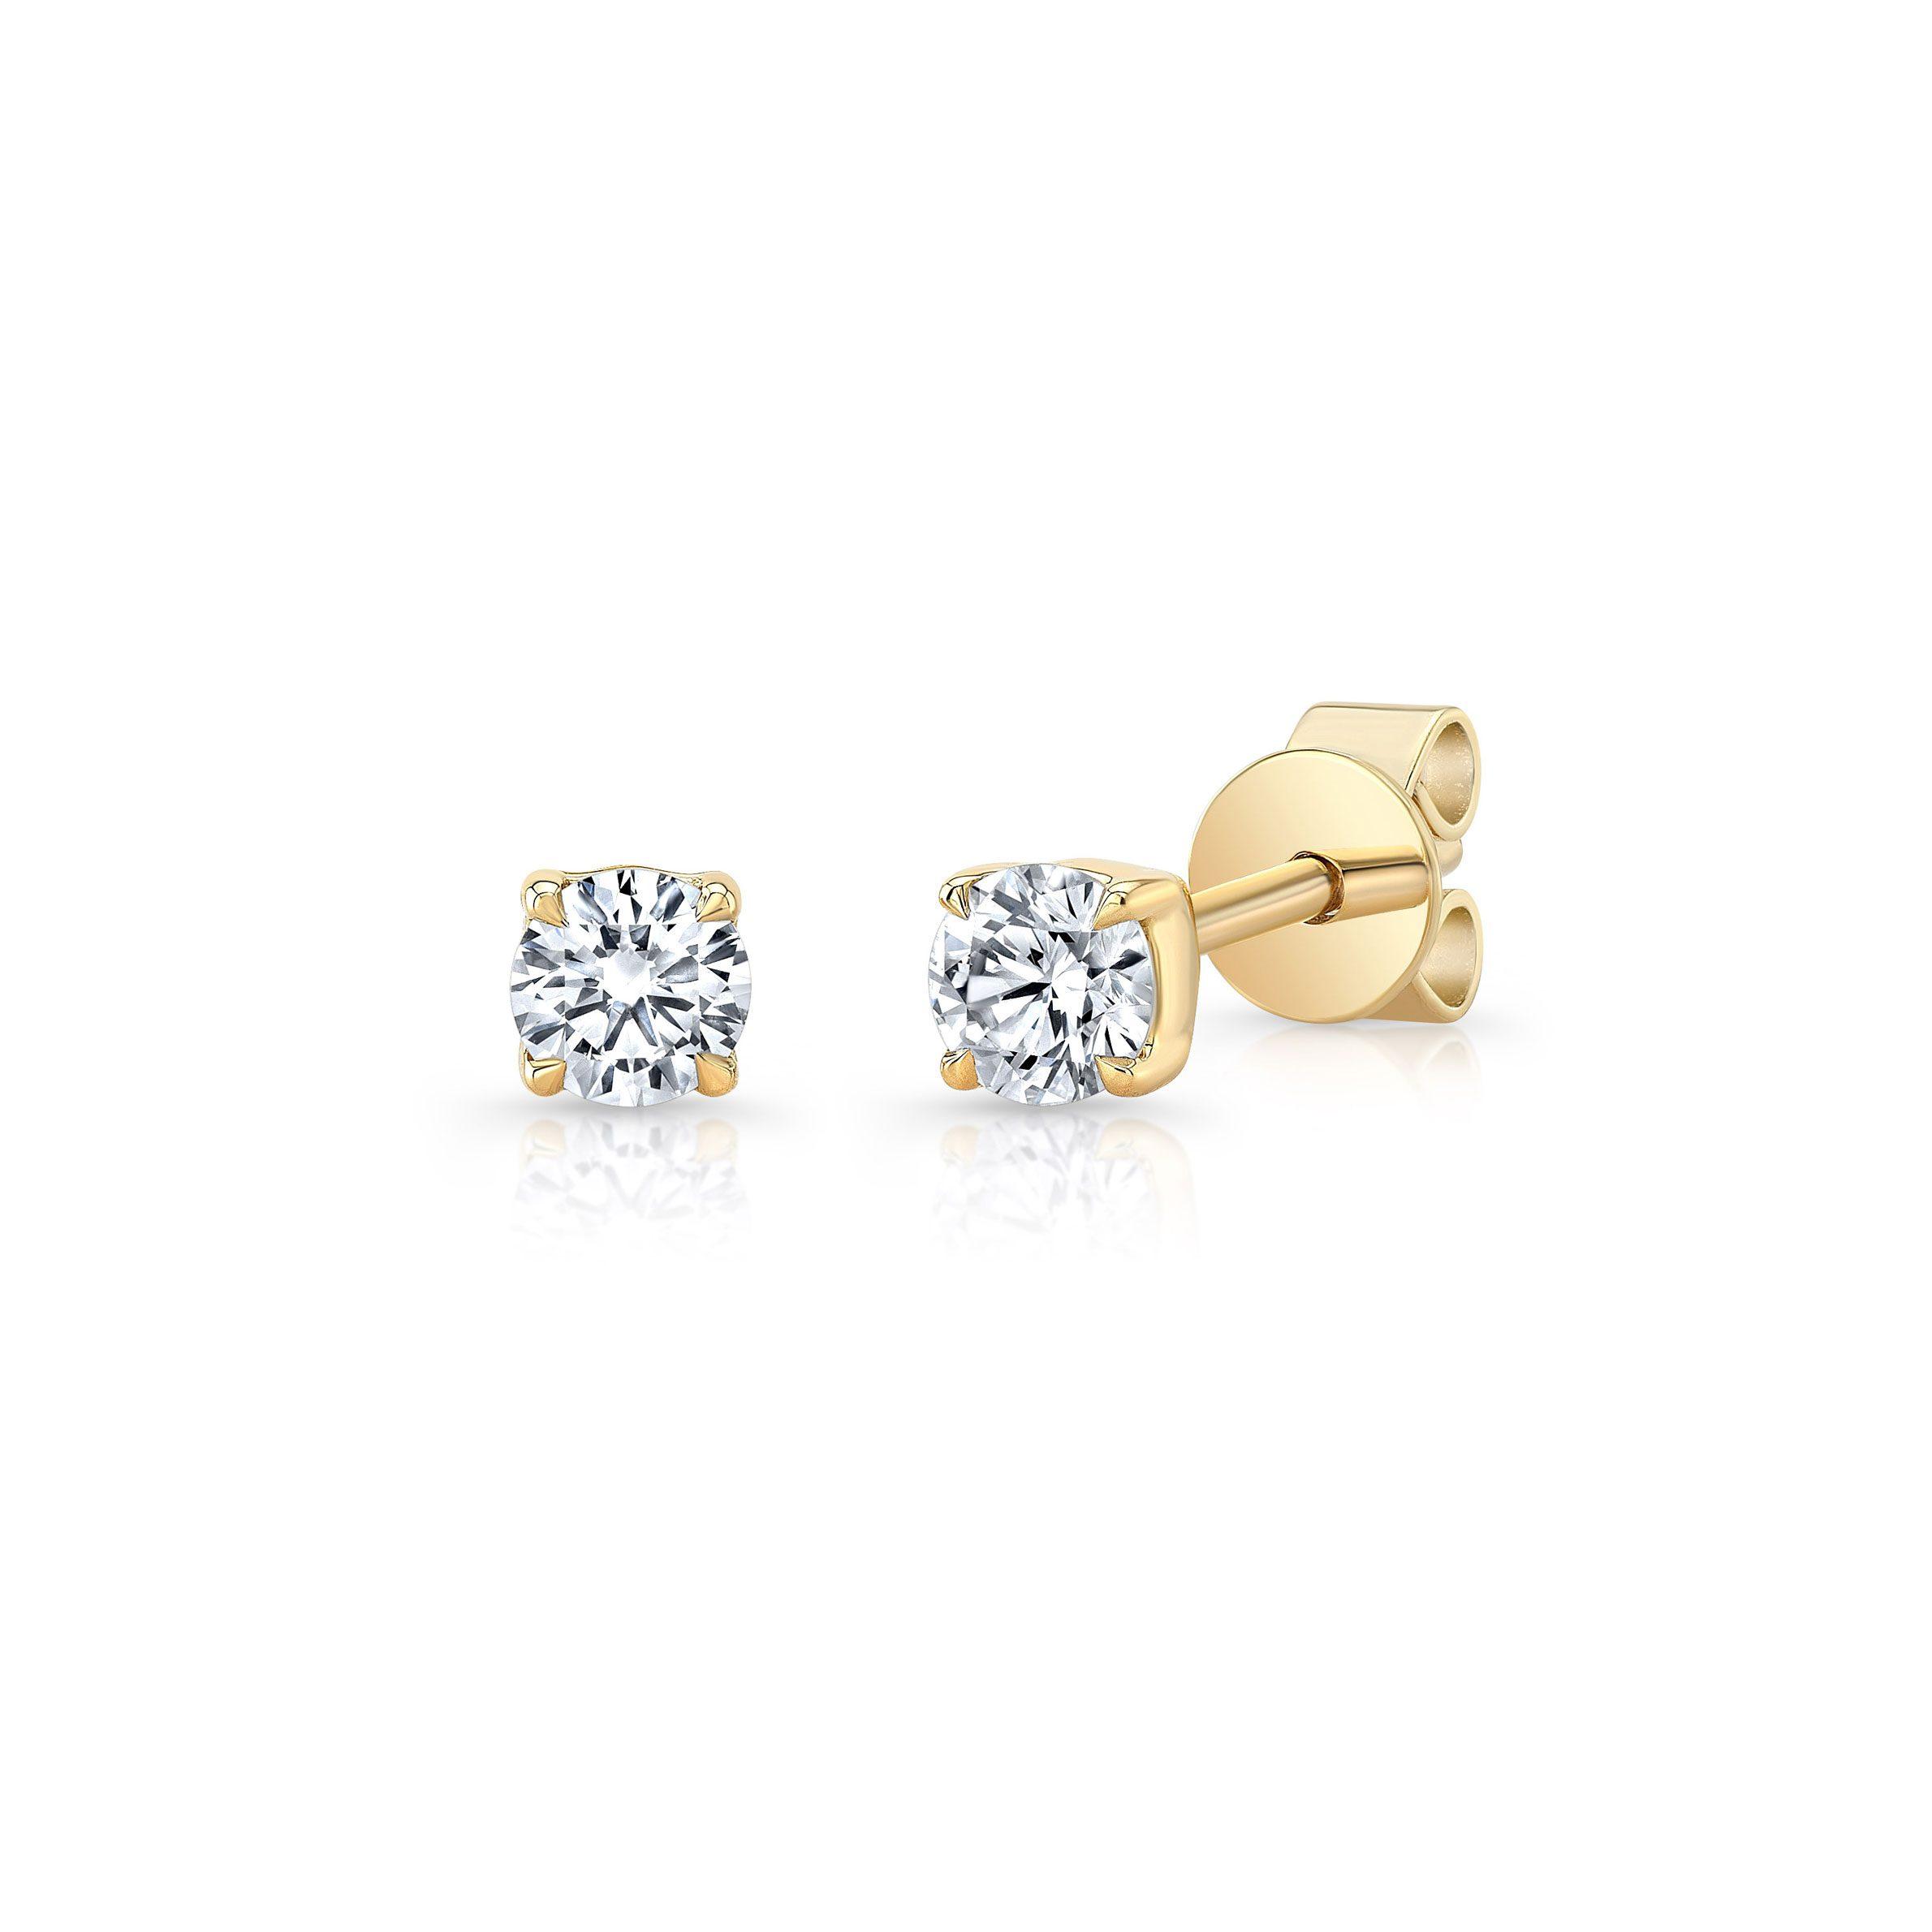 La Petite Round Brilliant Diamond Stud Earrings in 18k Yellow Gold Side View by Oui by Jean Dousset